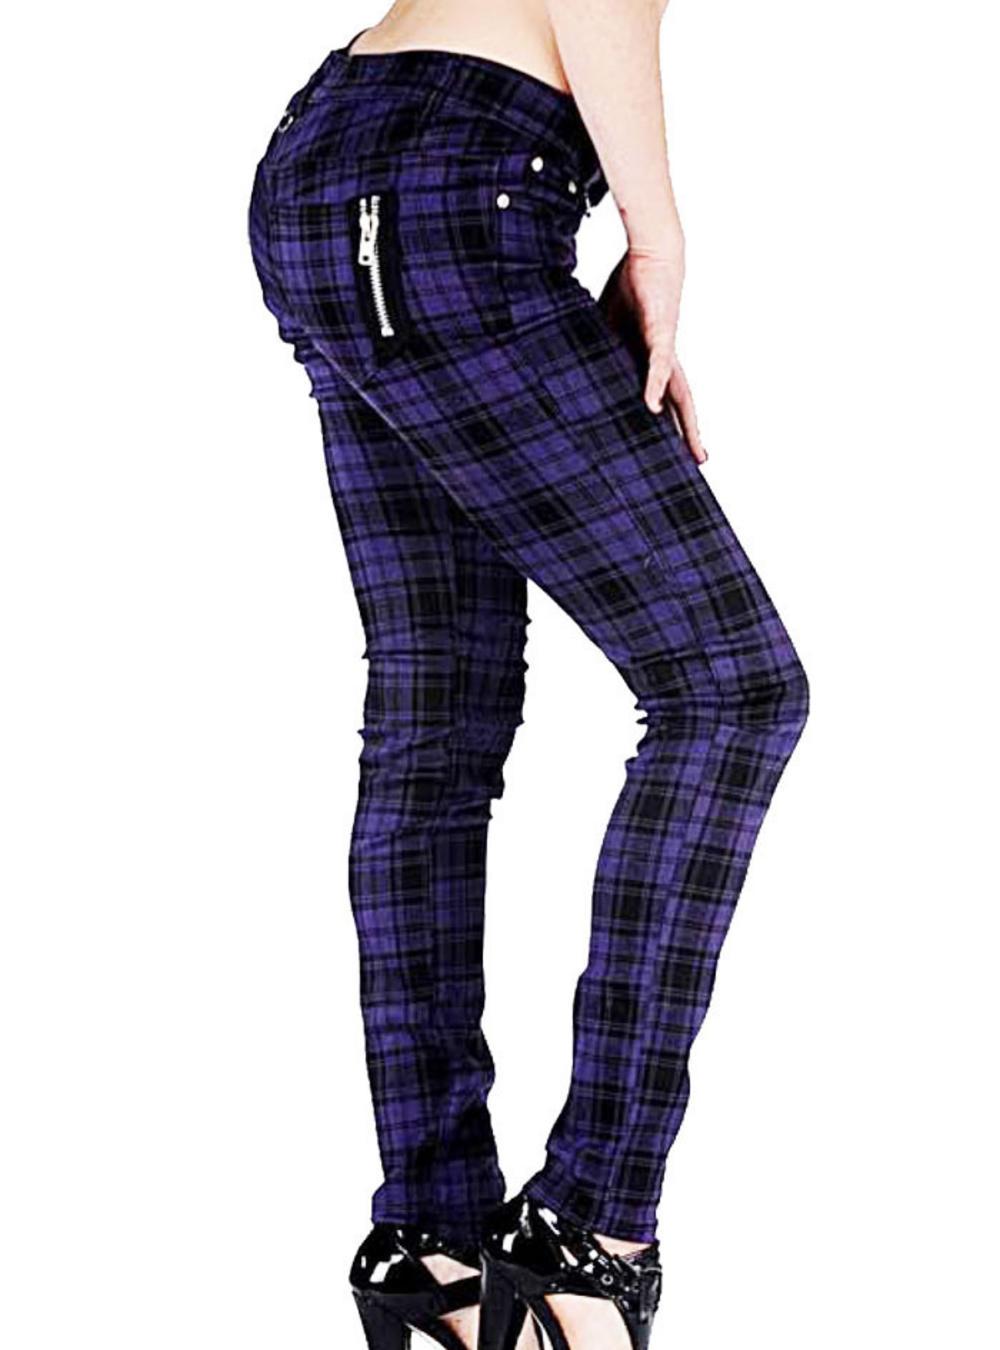 BANNED CLOTHING Punk/Goth SKINNY JEANS Tartan PURPLE Zips ...